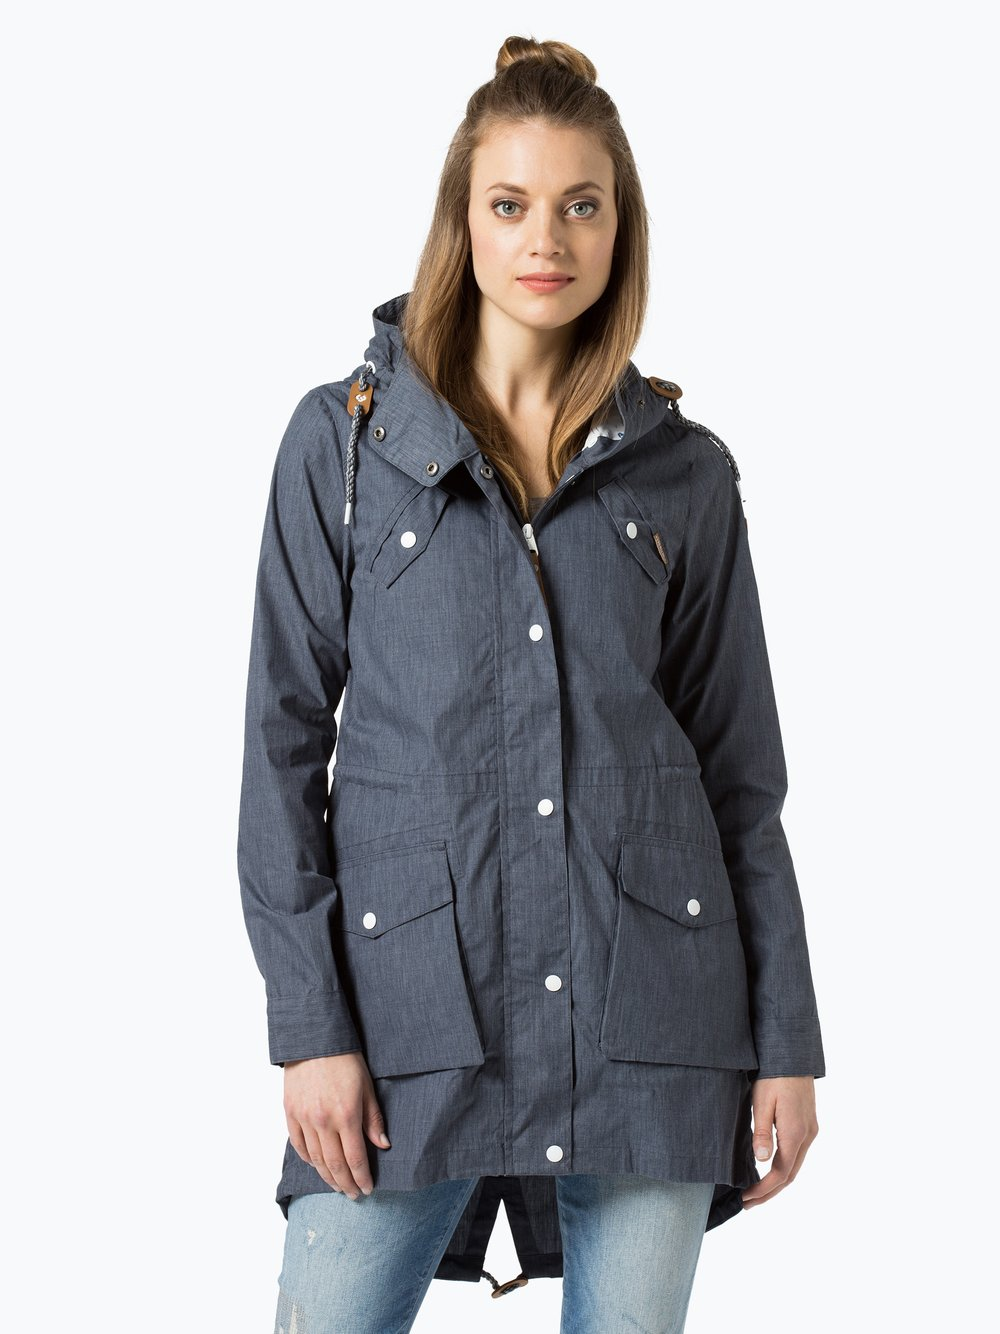 Clancy Ragwear Jacke Damen KaufenVangraaf Online com LqzVpGSMU